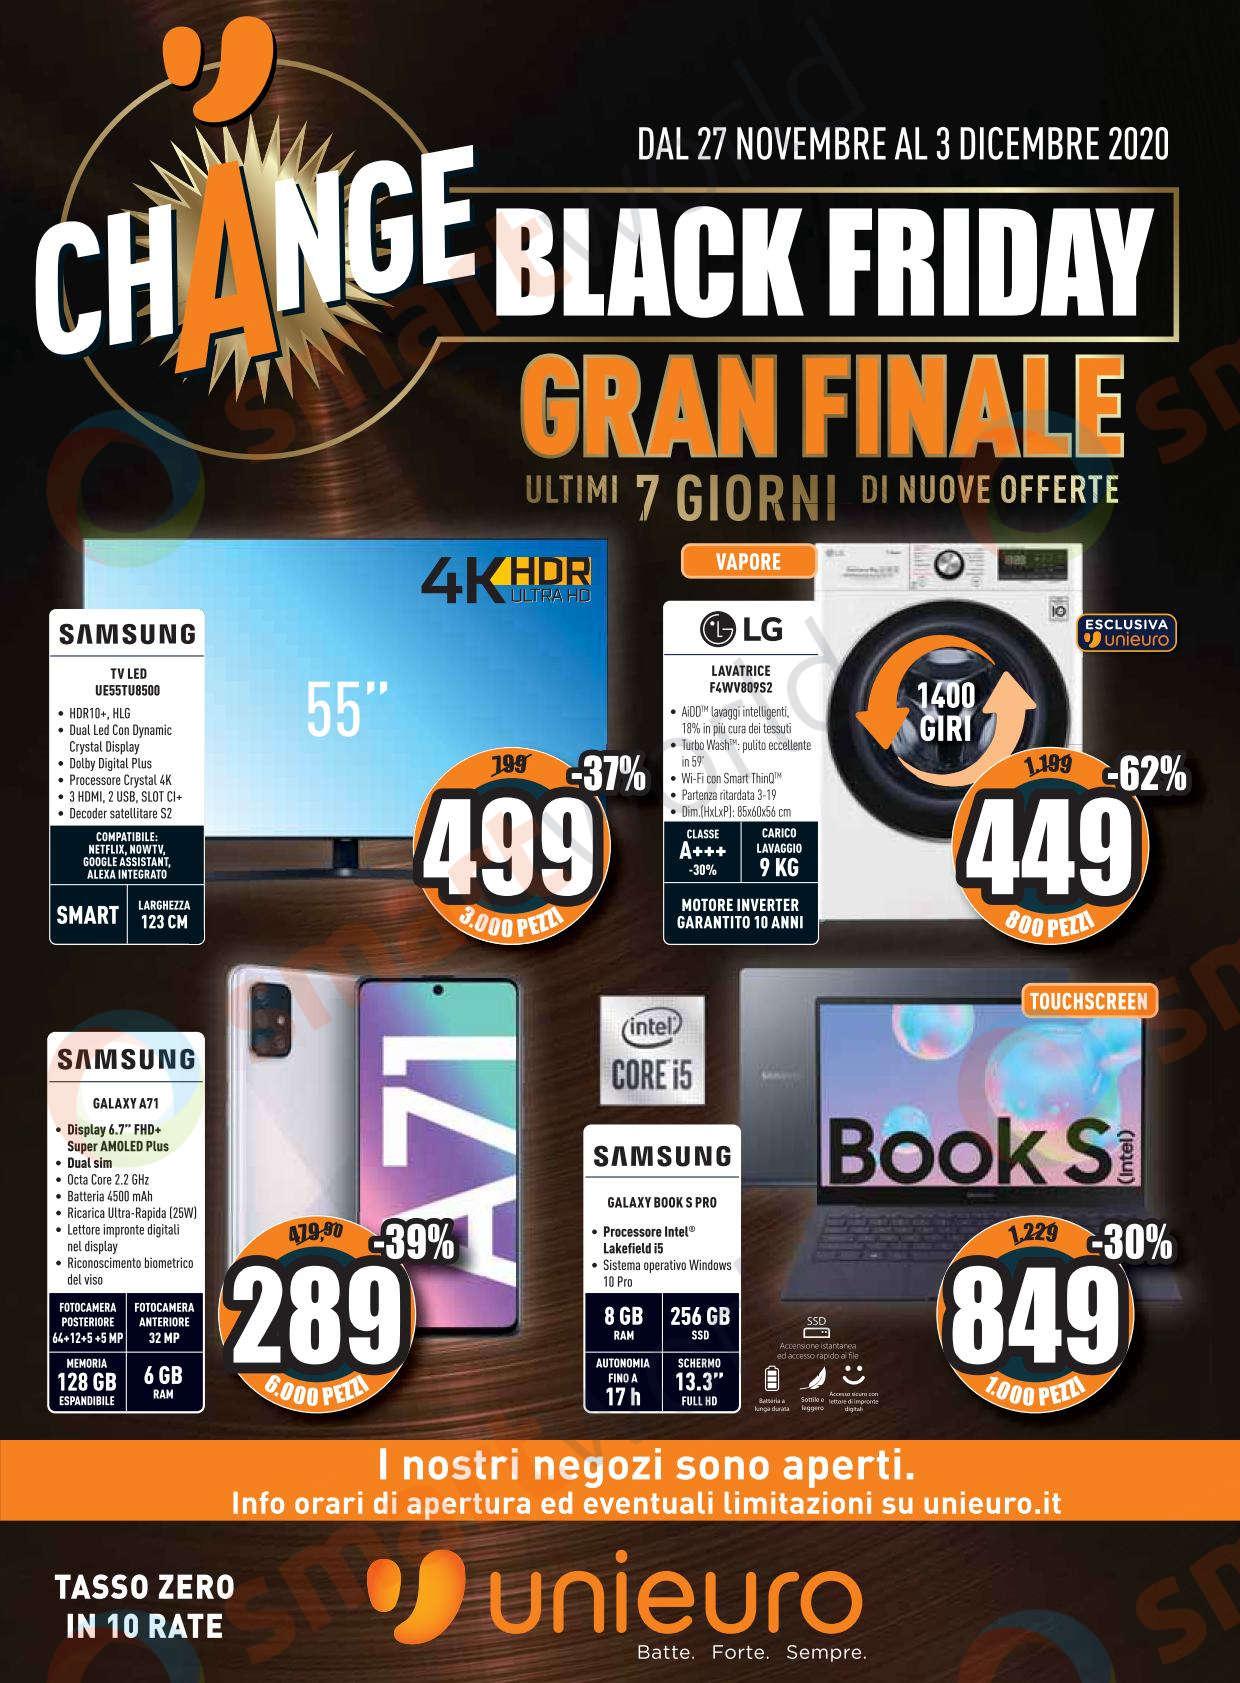 Volantino Unieuro BLACK FRIDAY Gran Finale 27 nov – 30 dic 2020 (1)